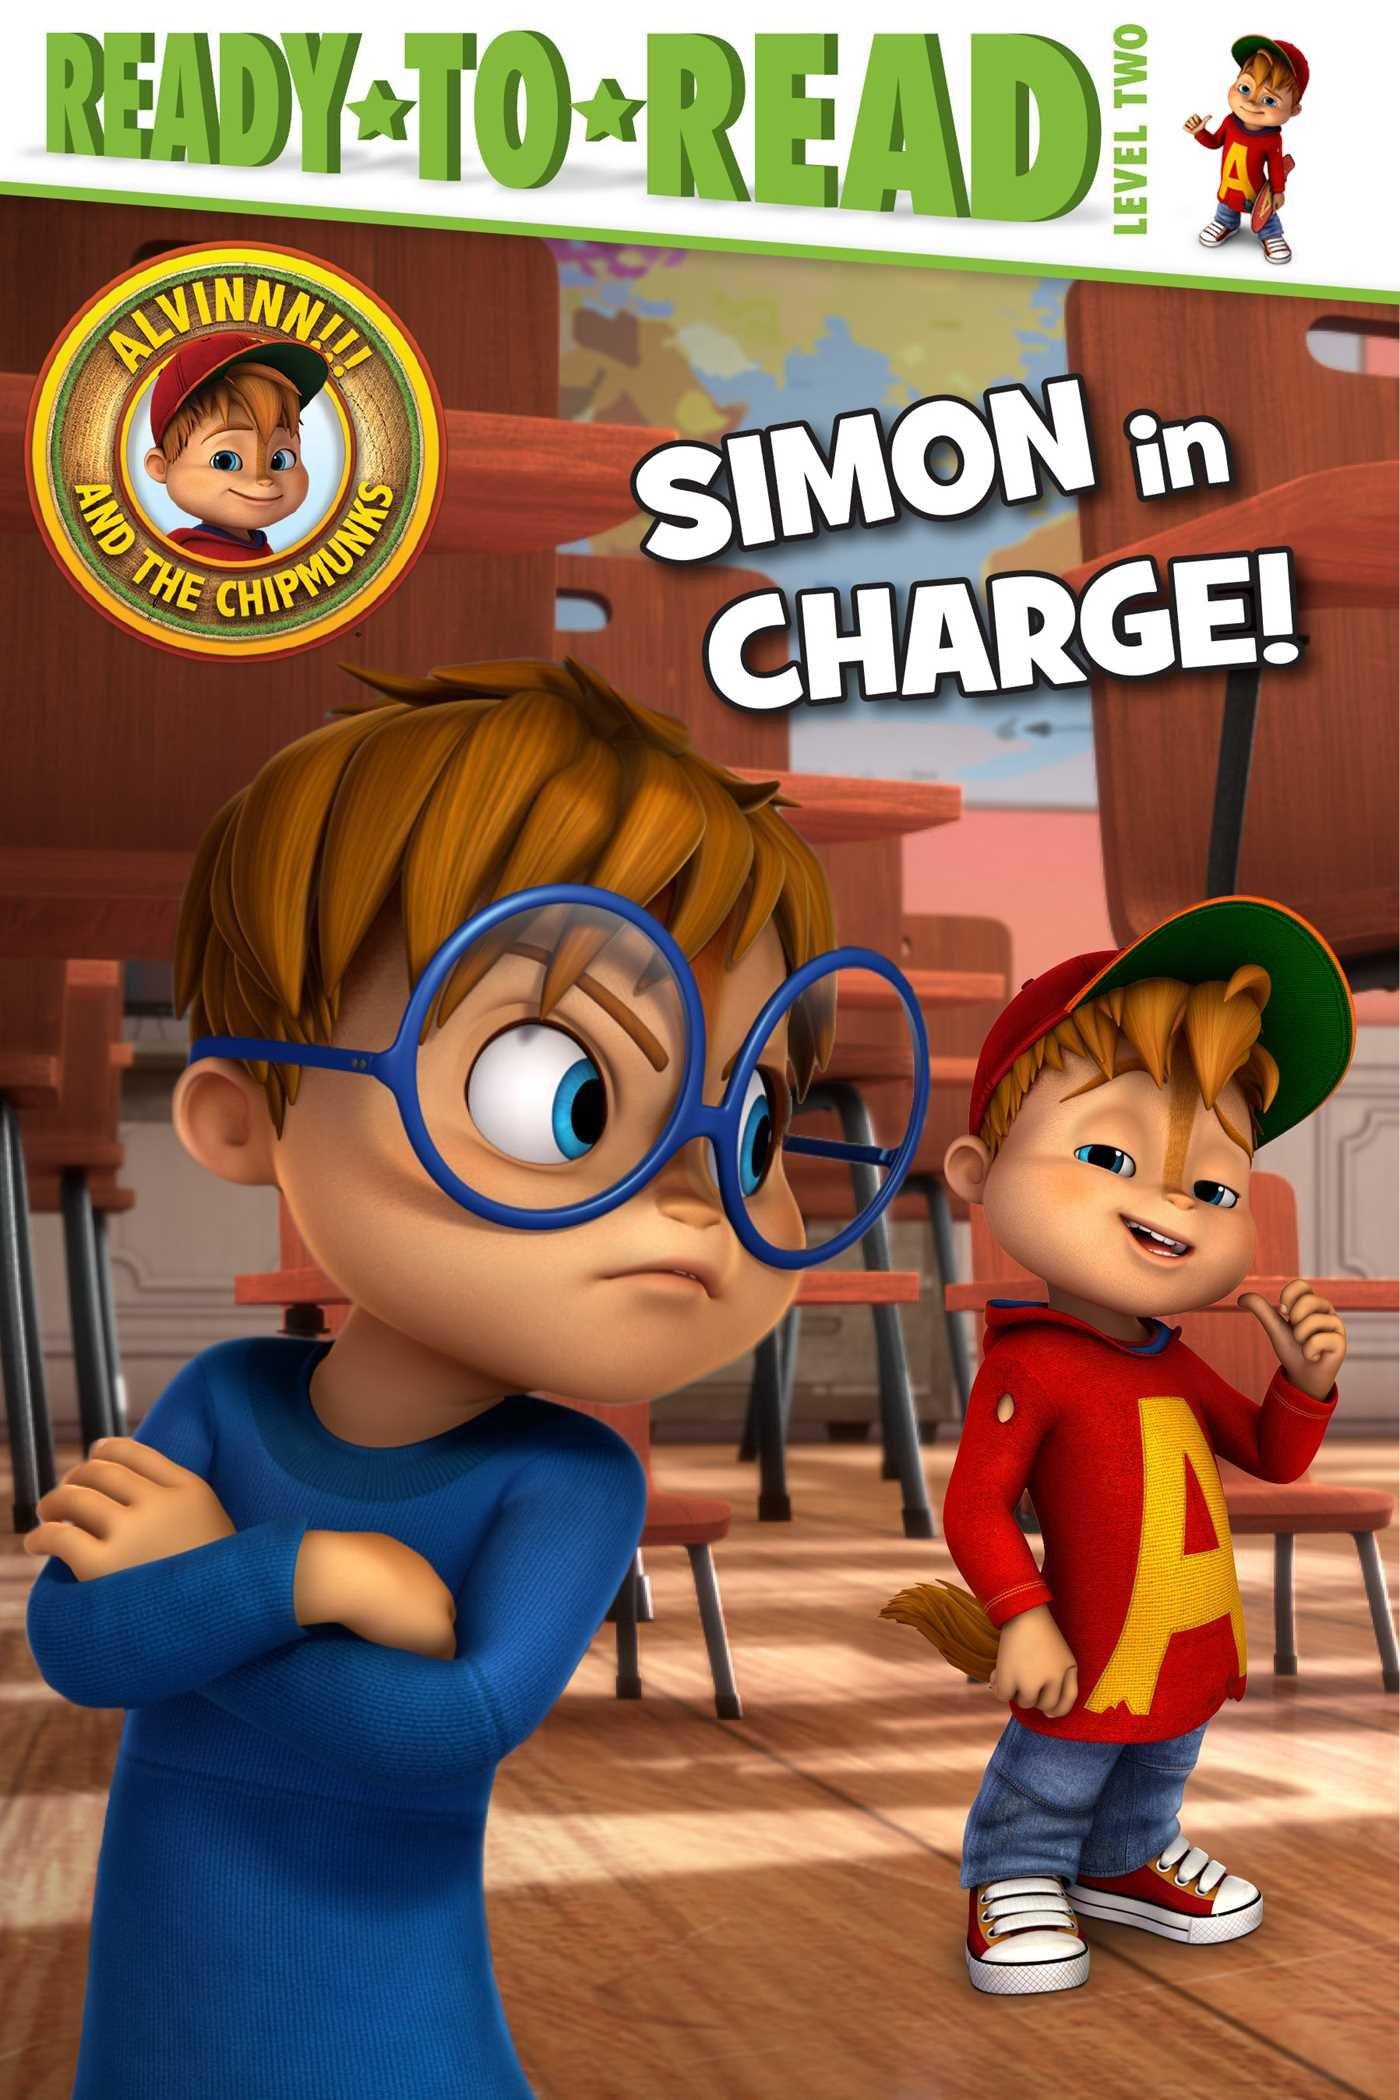 Simon In Charge Alvinnn And The Chipmunks Forte Lauren 9781534416291 Amazon Com Books